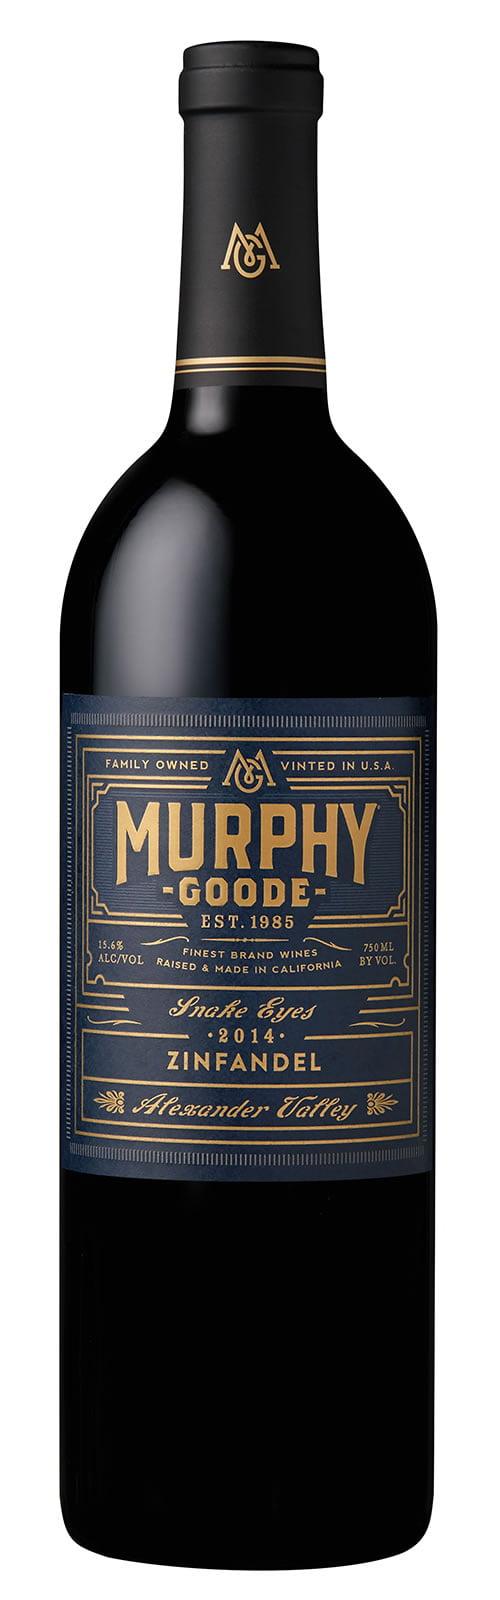 dizajn etikete za vino murphy goode